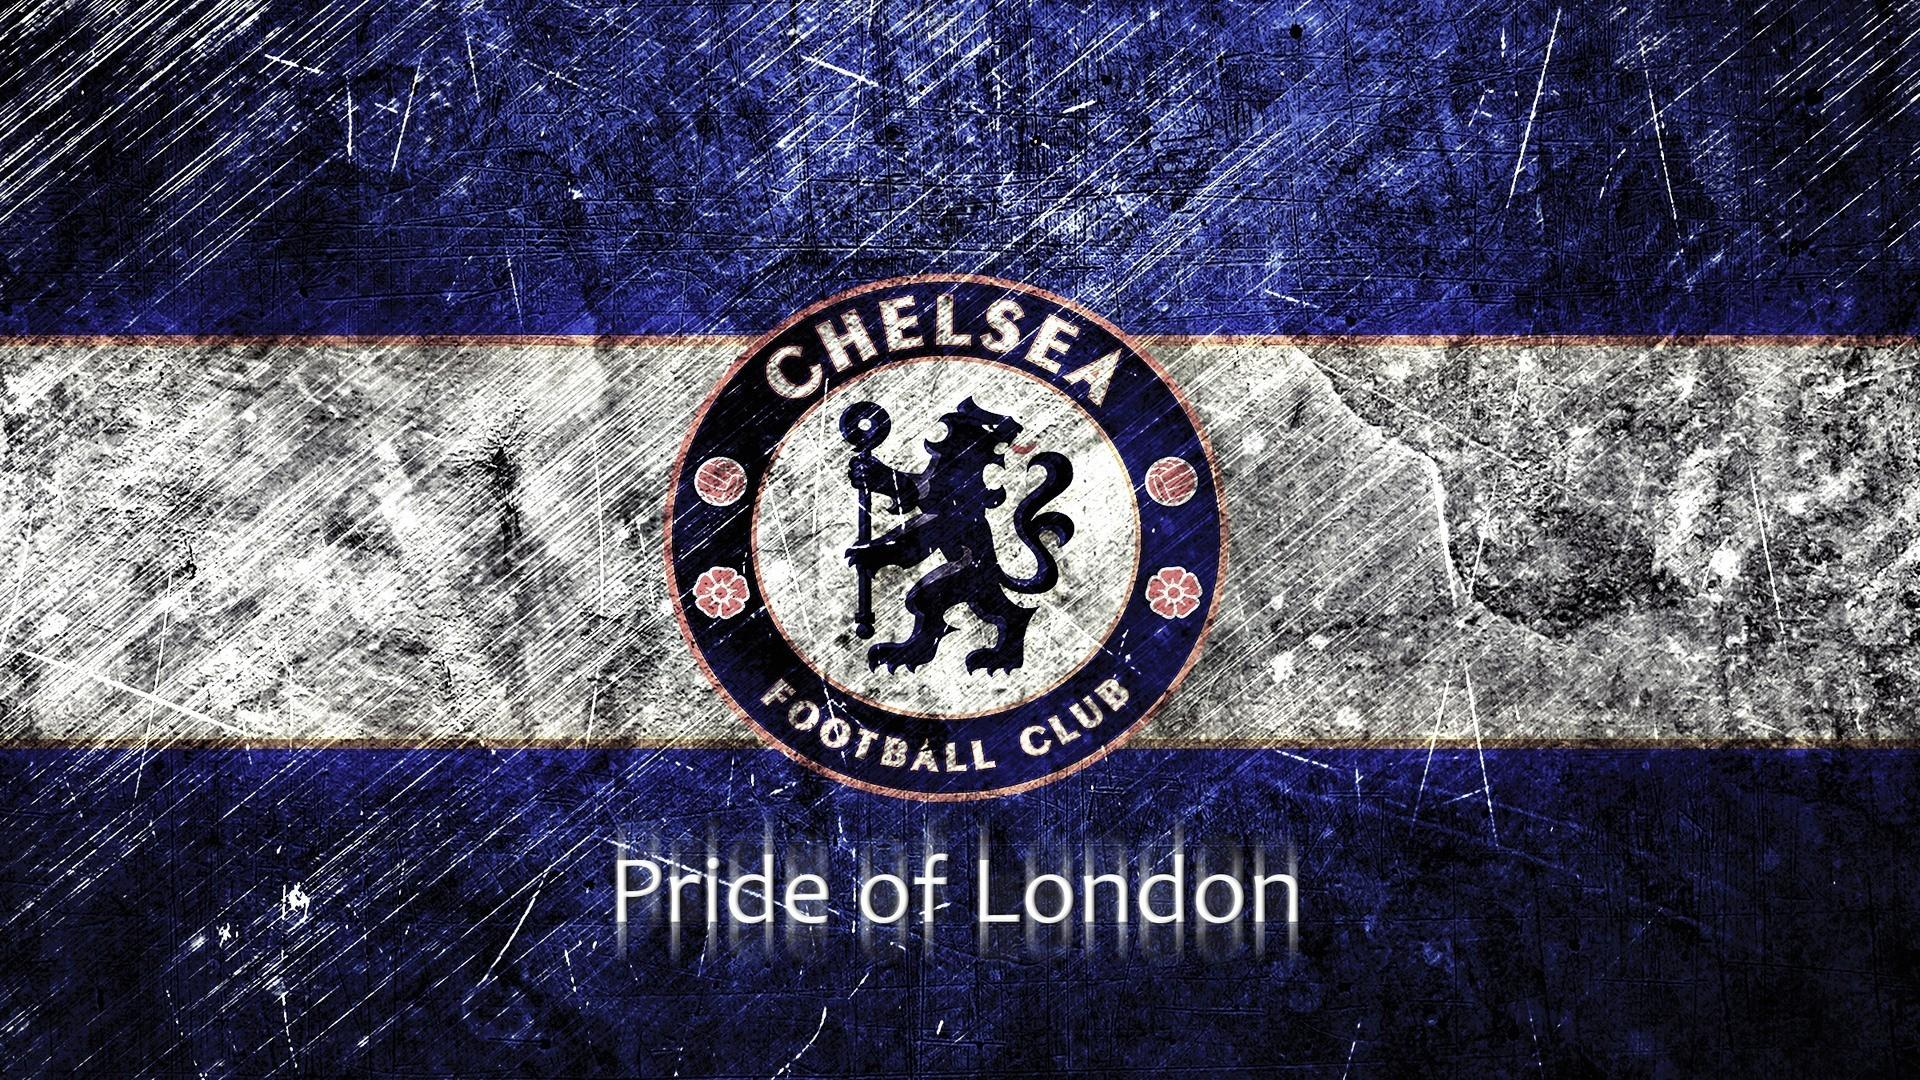 General 1920x1080 Chelsea FC Premier League soccer logo soccer clubs sport  sports